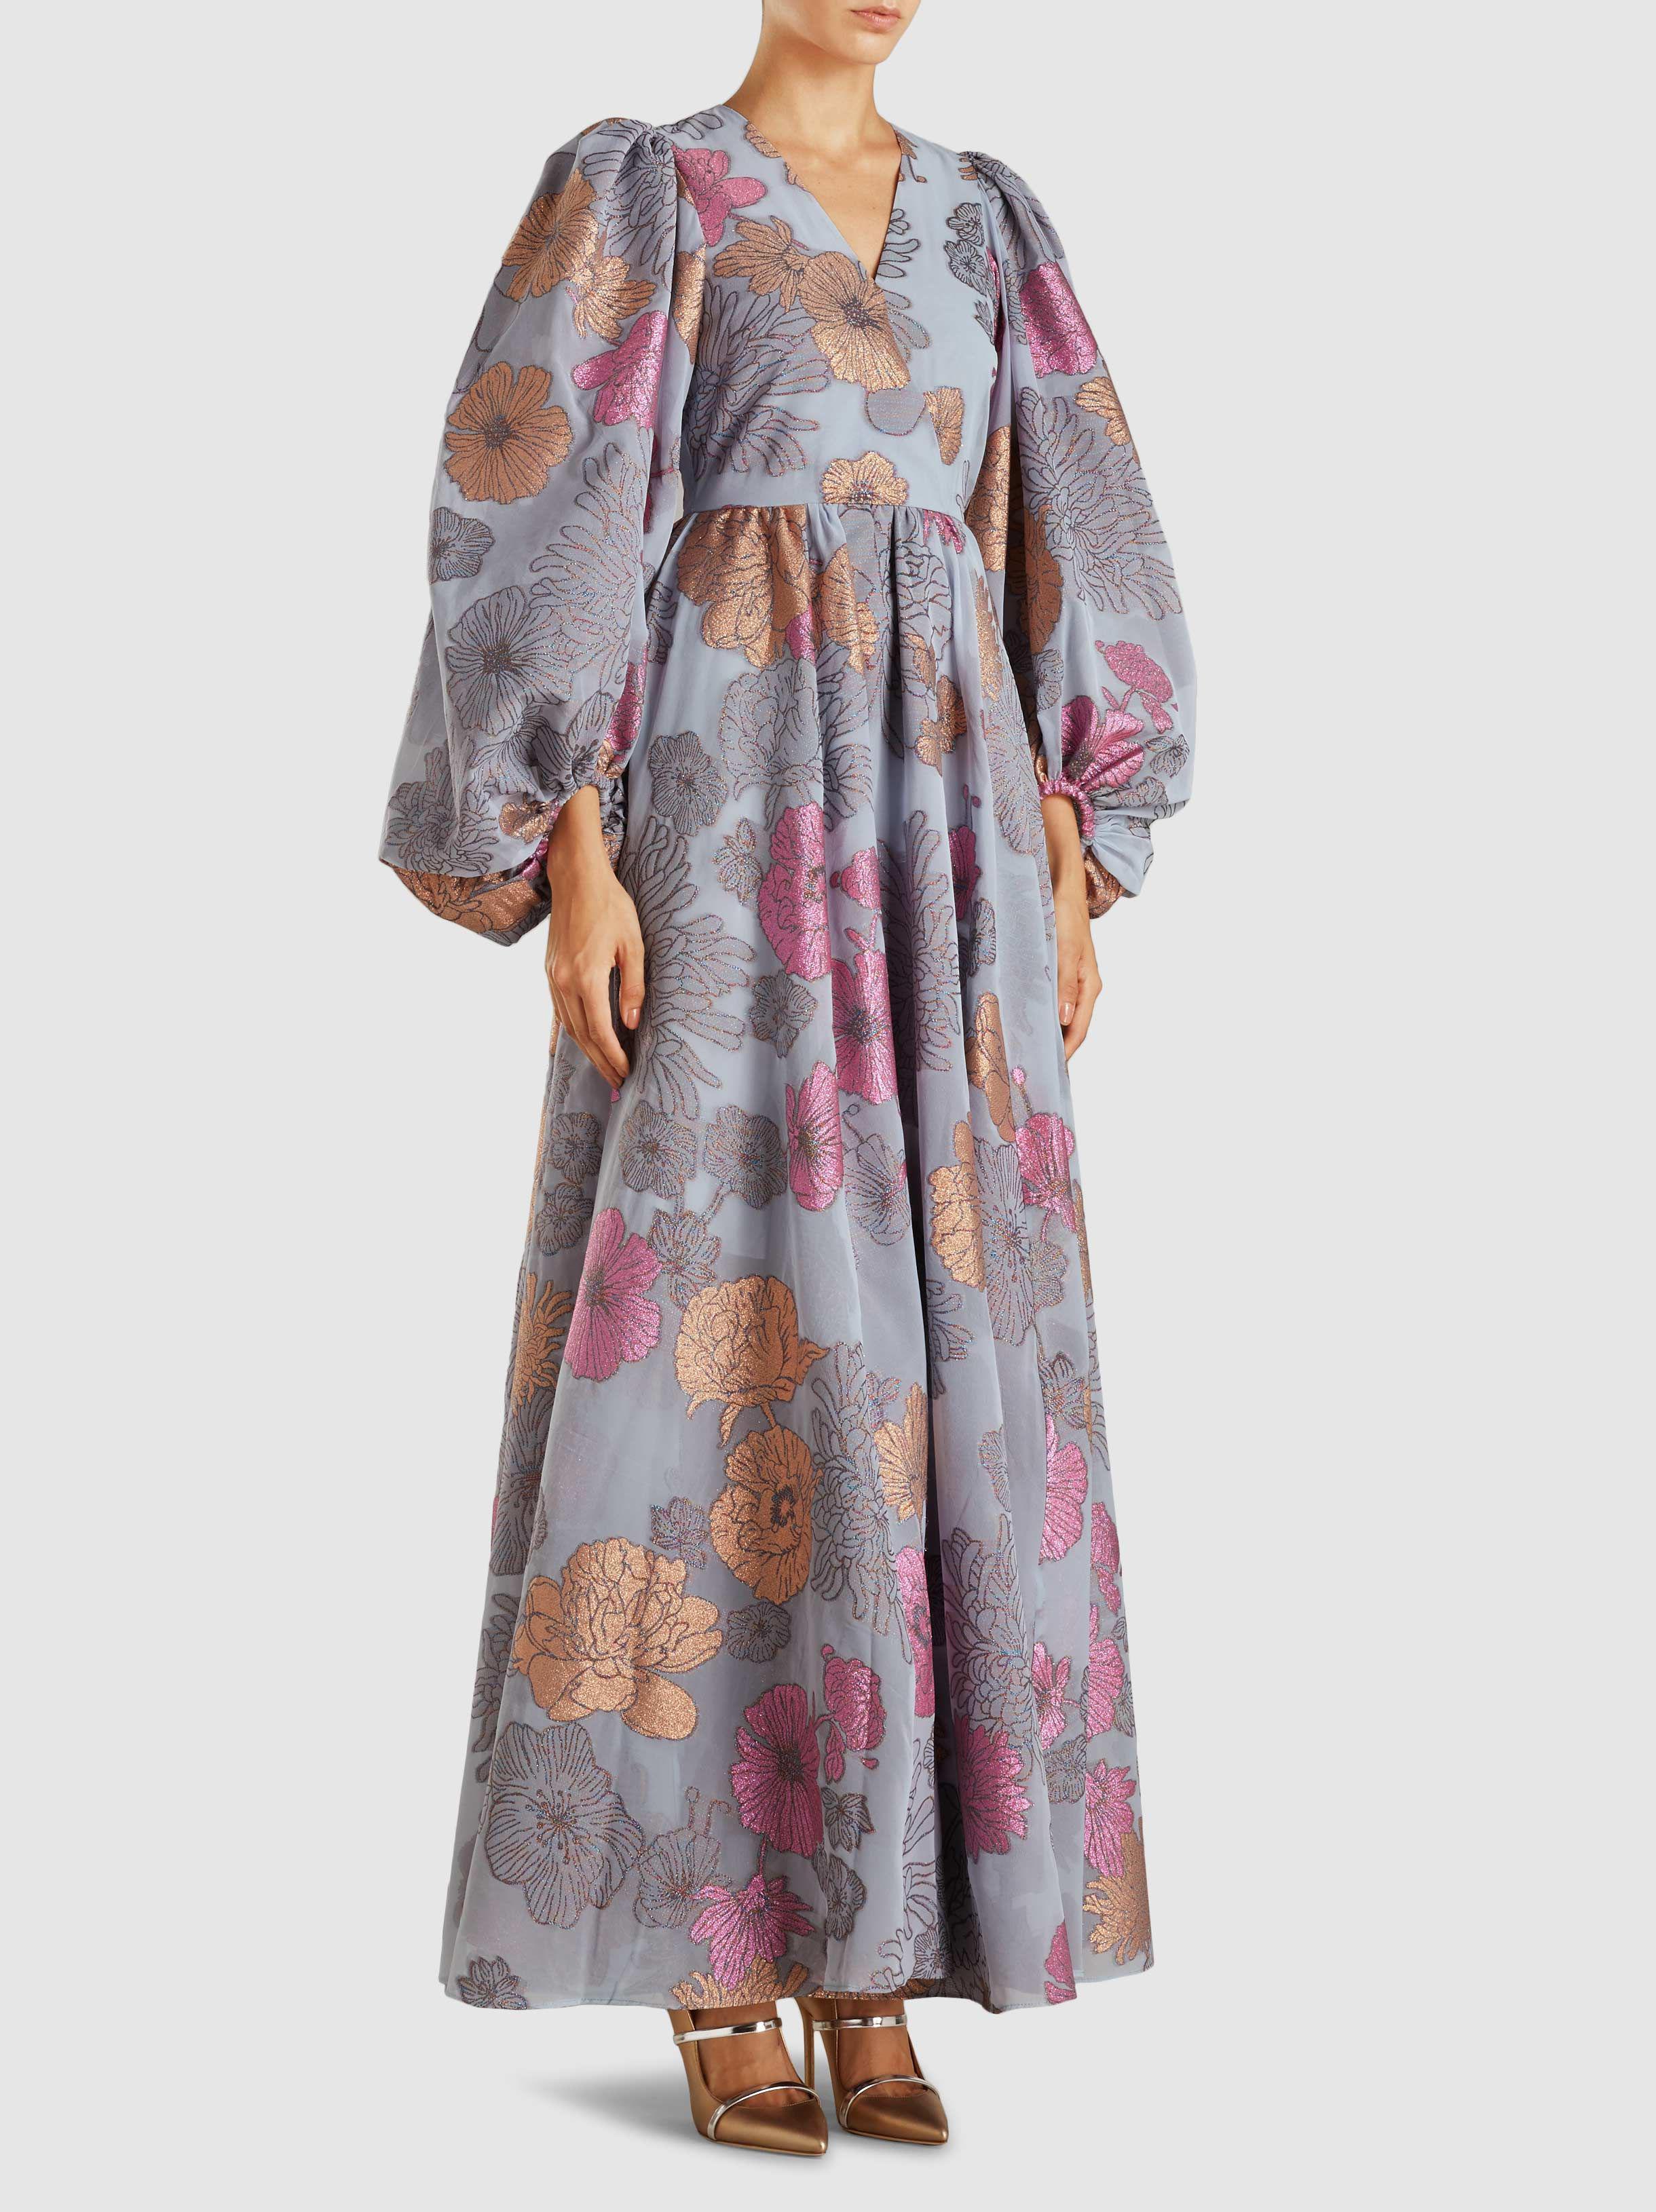 Baba Floral-Jacquard Maxi Dress Stine Goya Jivc4G